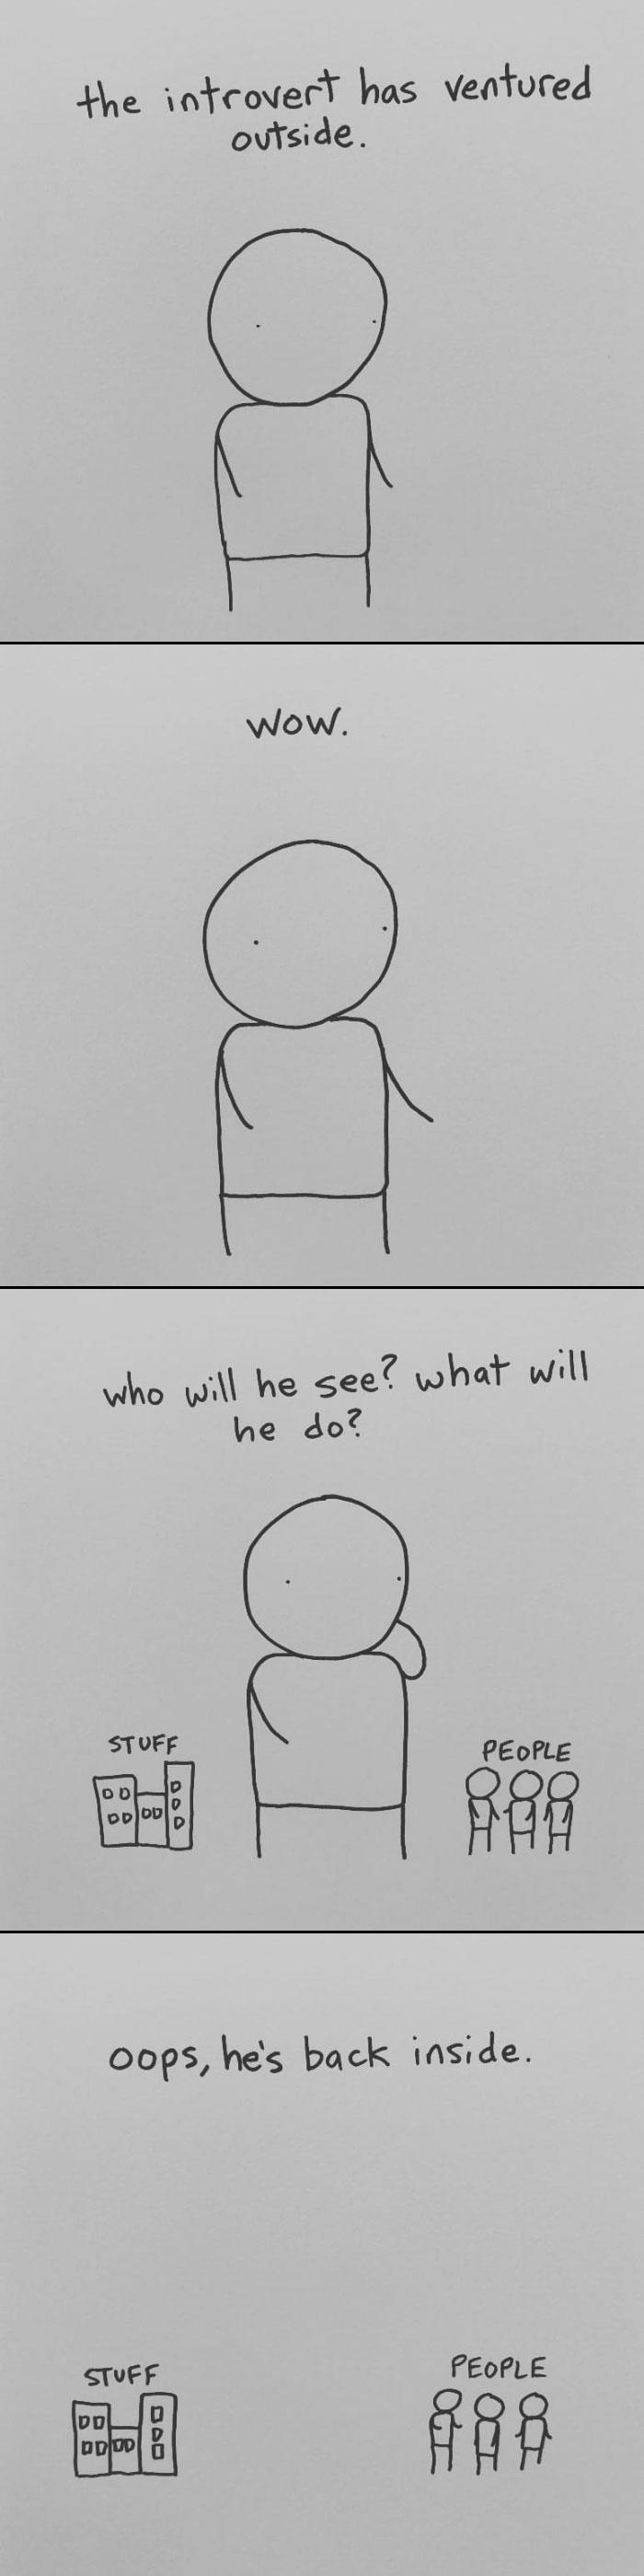 I Draw Minimalist ics About My Mental Health To Help